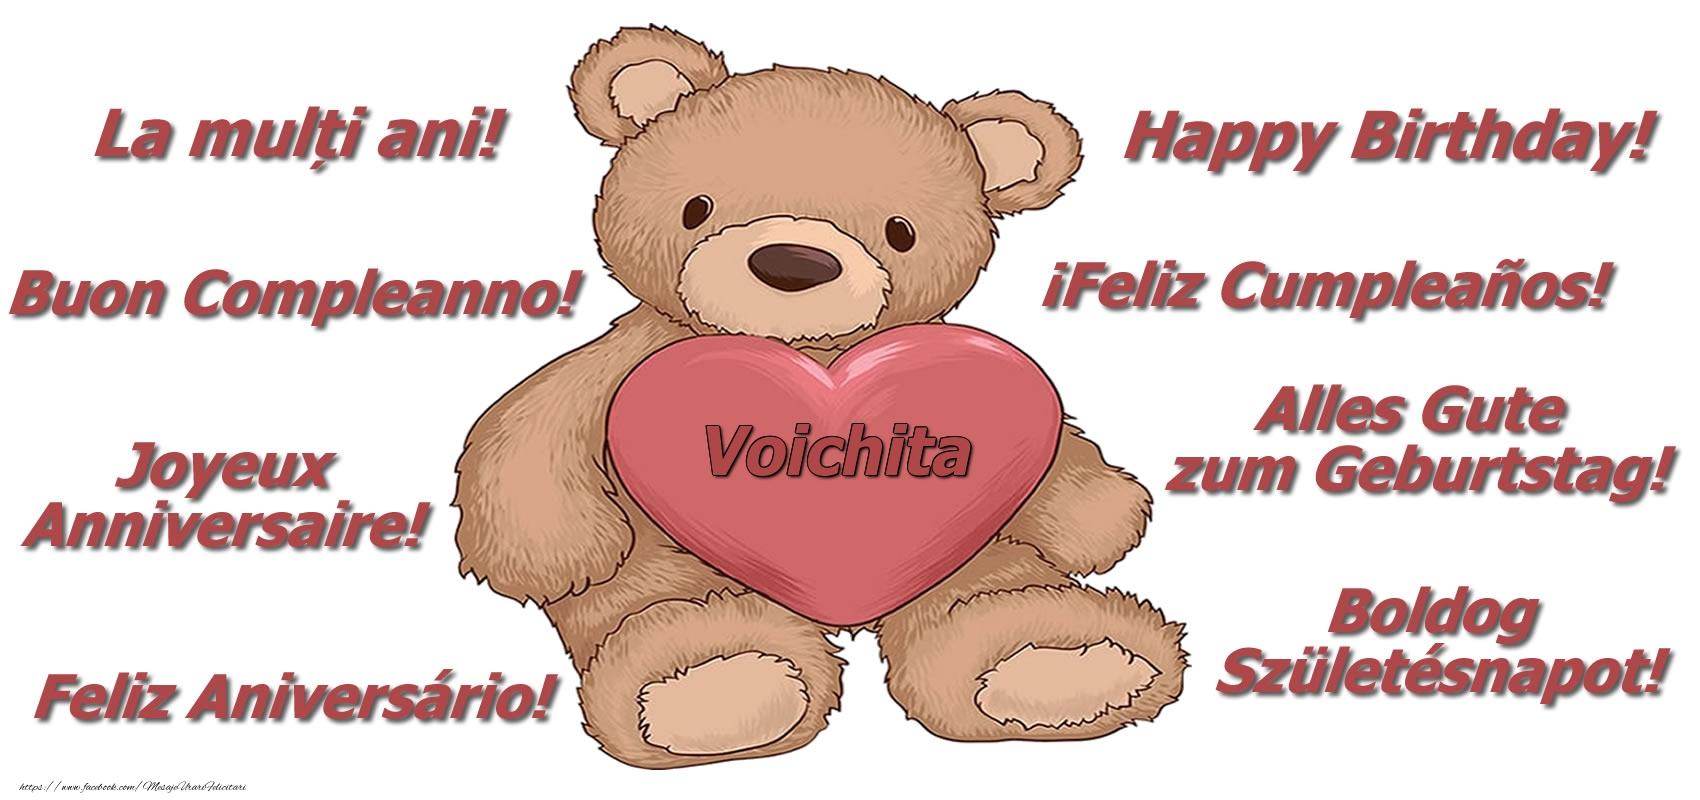 Felicitari de zi de nastere - La multi ani Voichita! - Ursulet